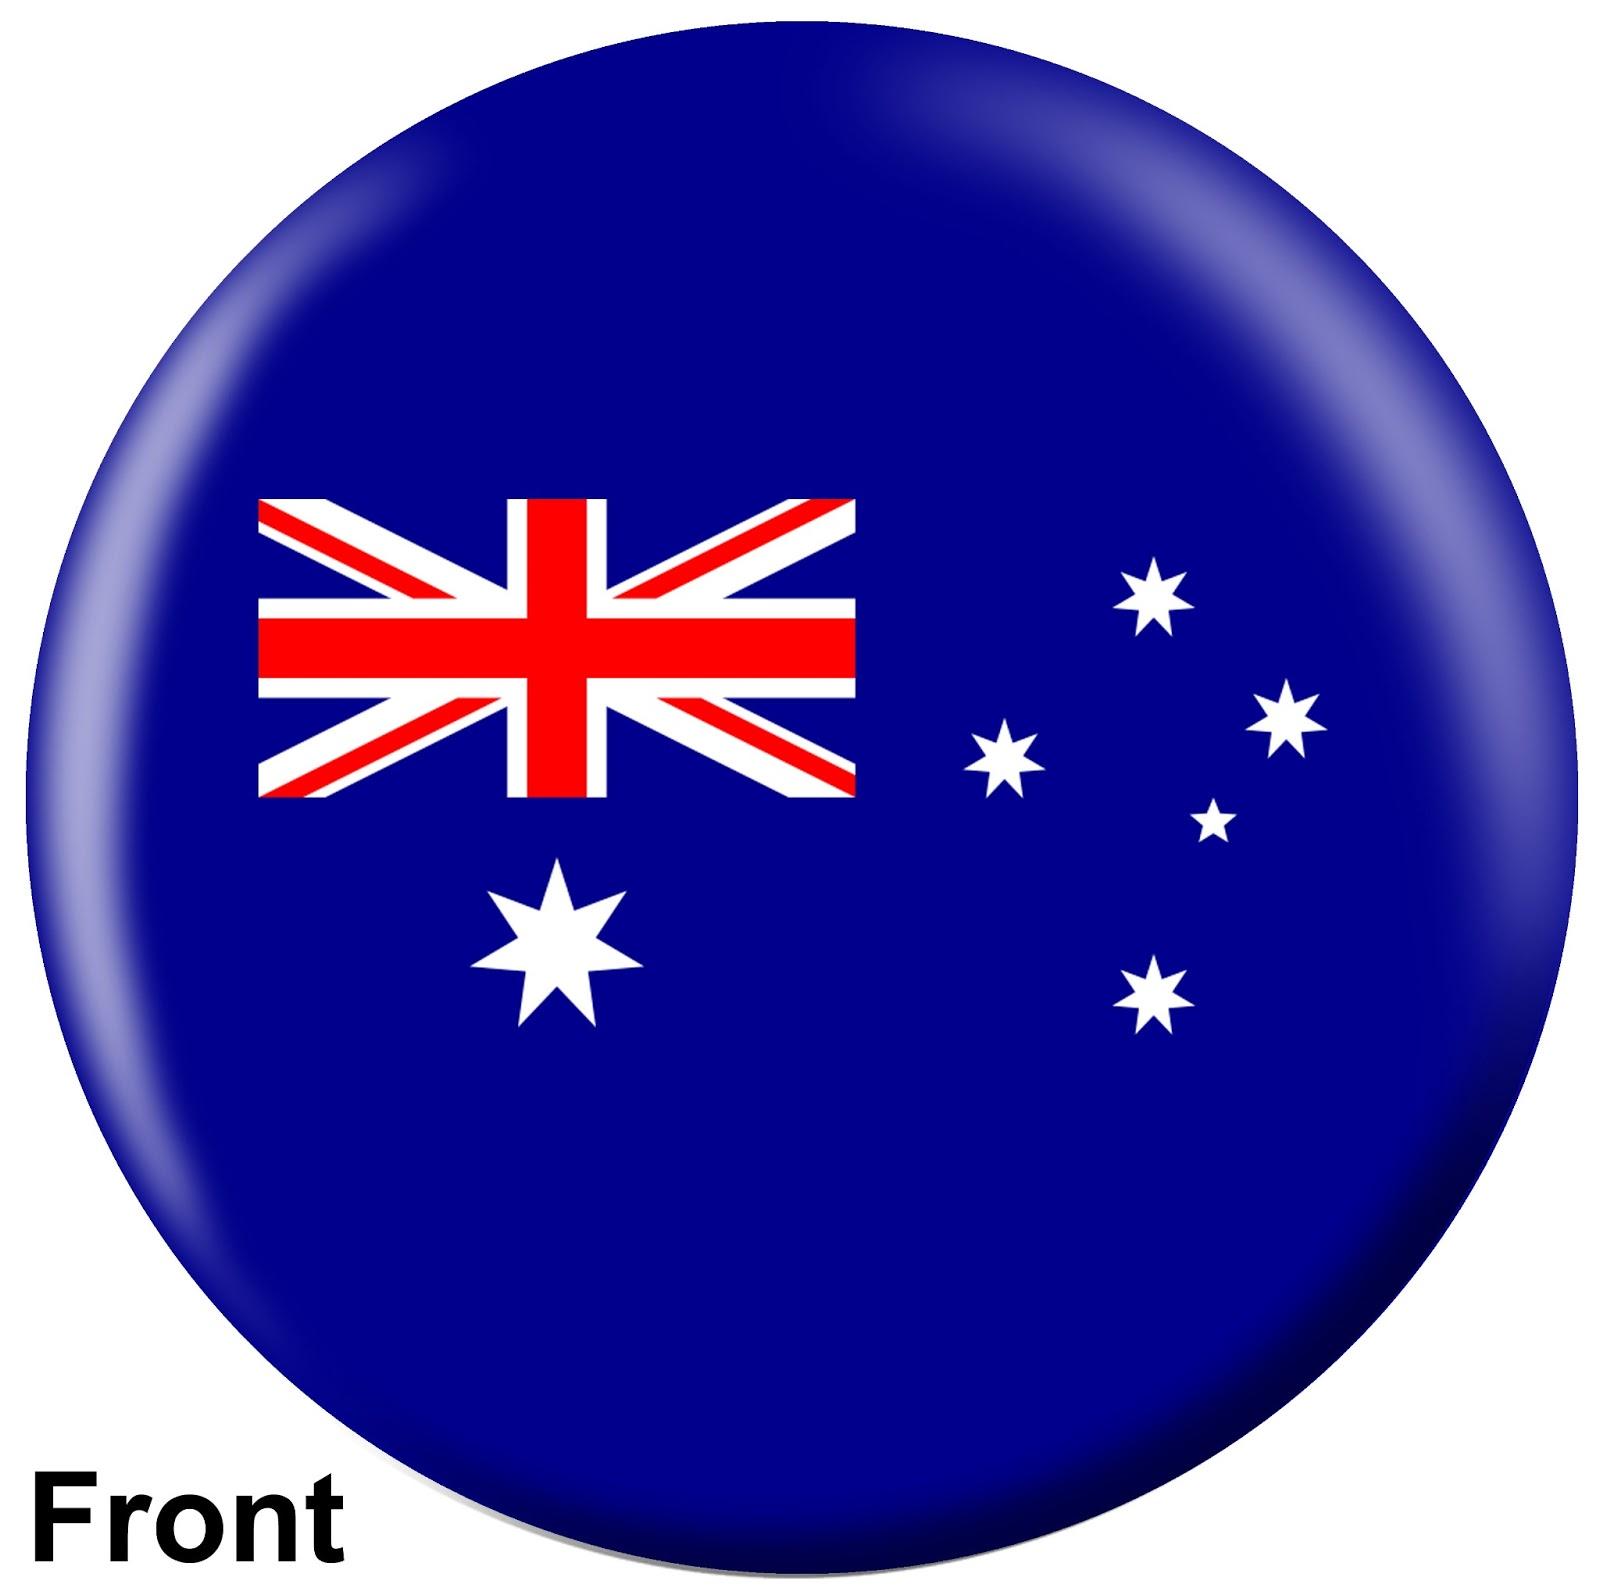 Australian Flag Hd Images Free Download